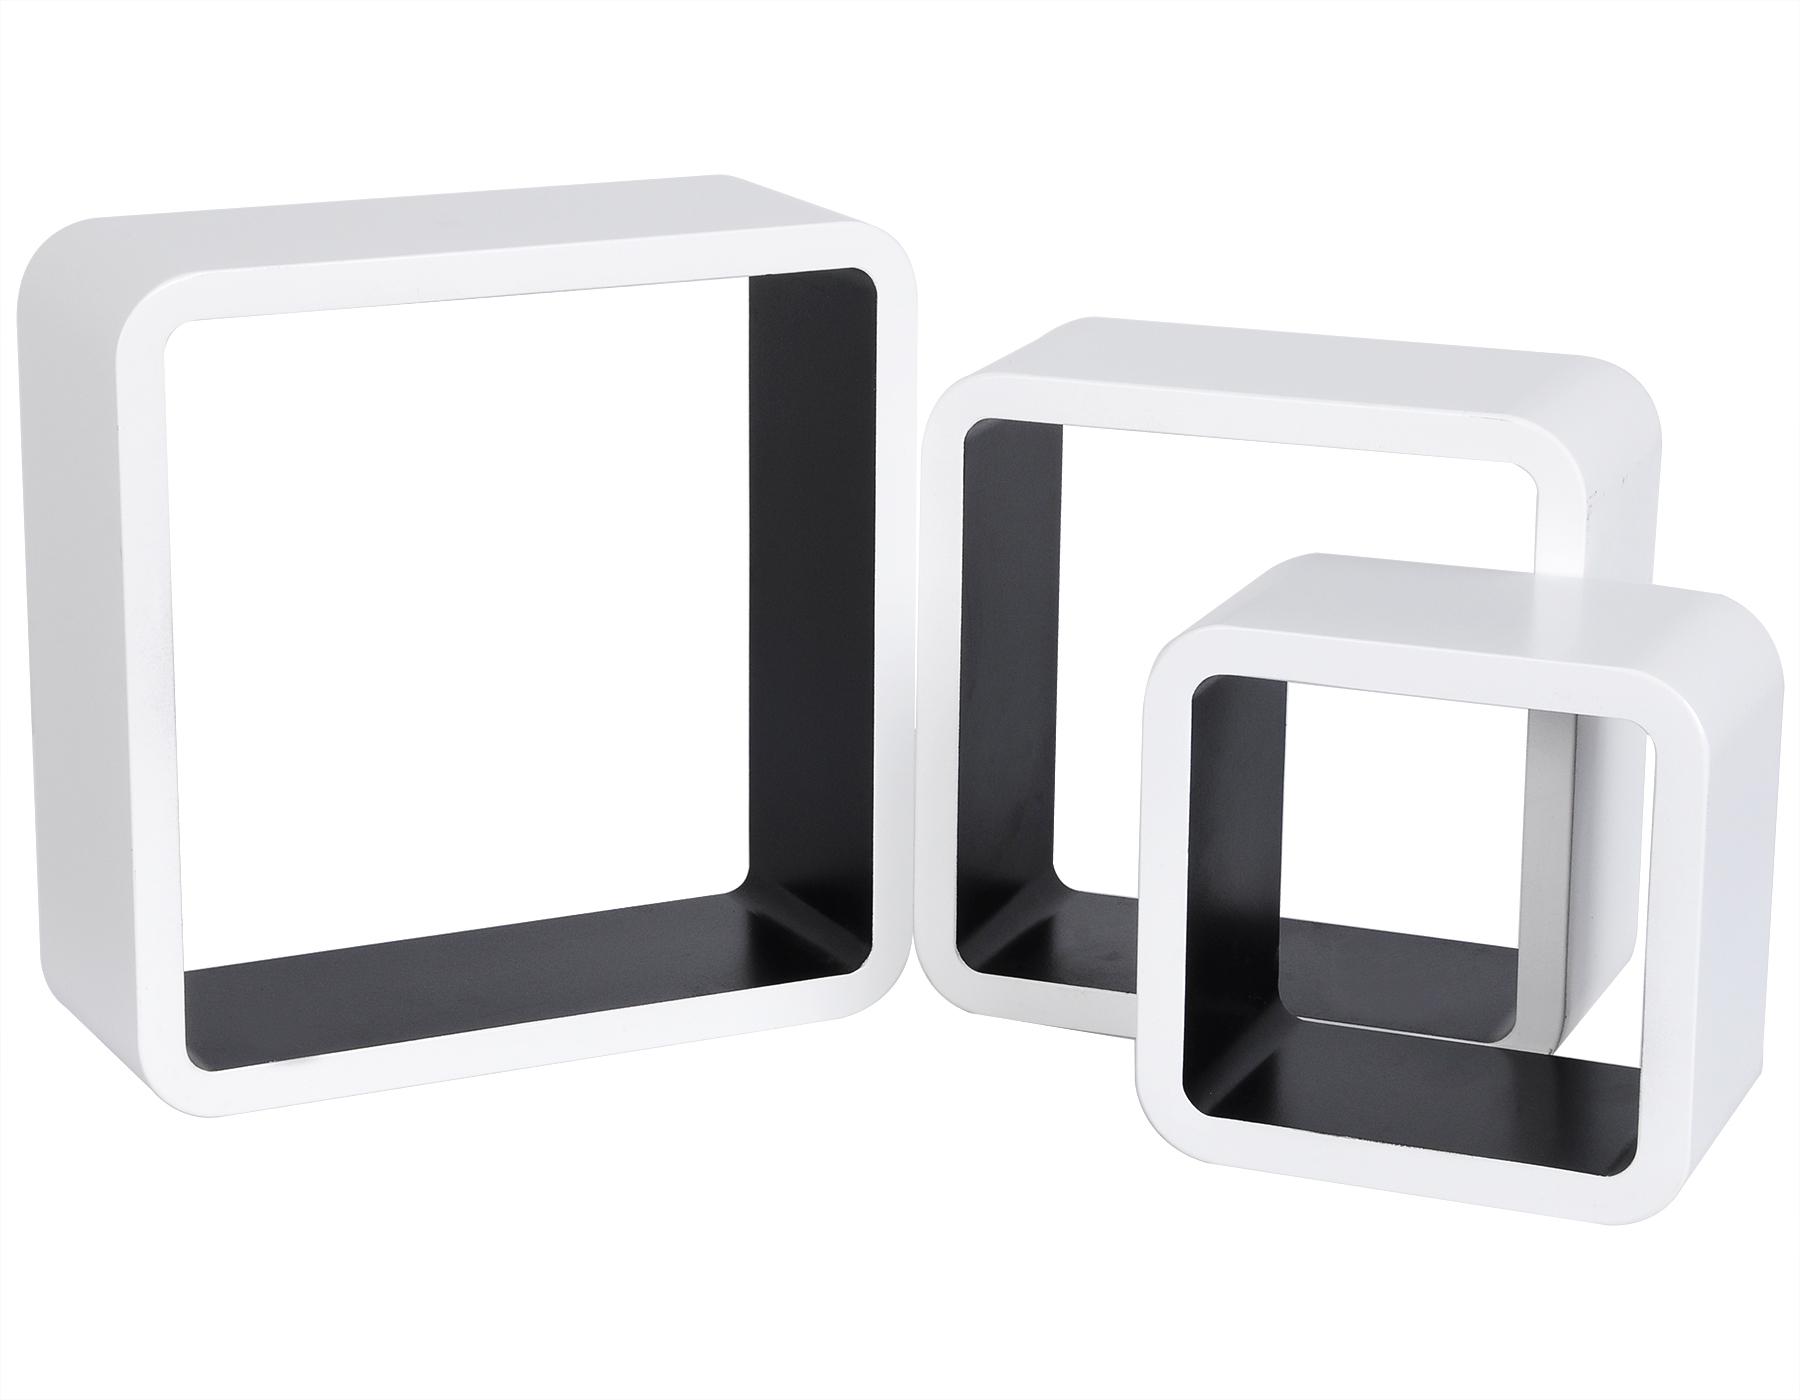 wandregal h ngeregal b cherregal cd regal cube regale holz wei schwarz rg9236sz ebay. Black Bedroom Furniture Sets. Home Design Ideas